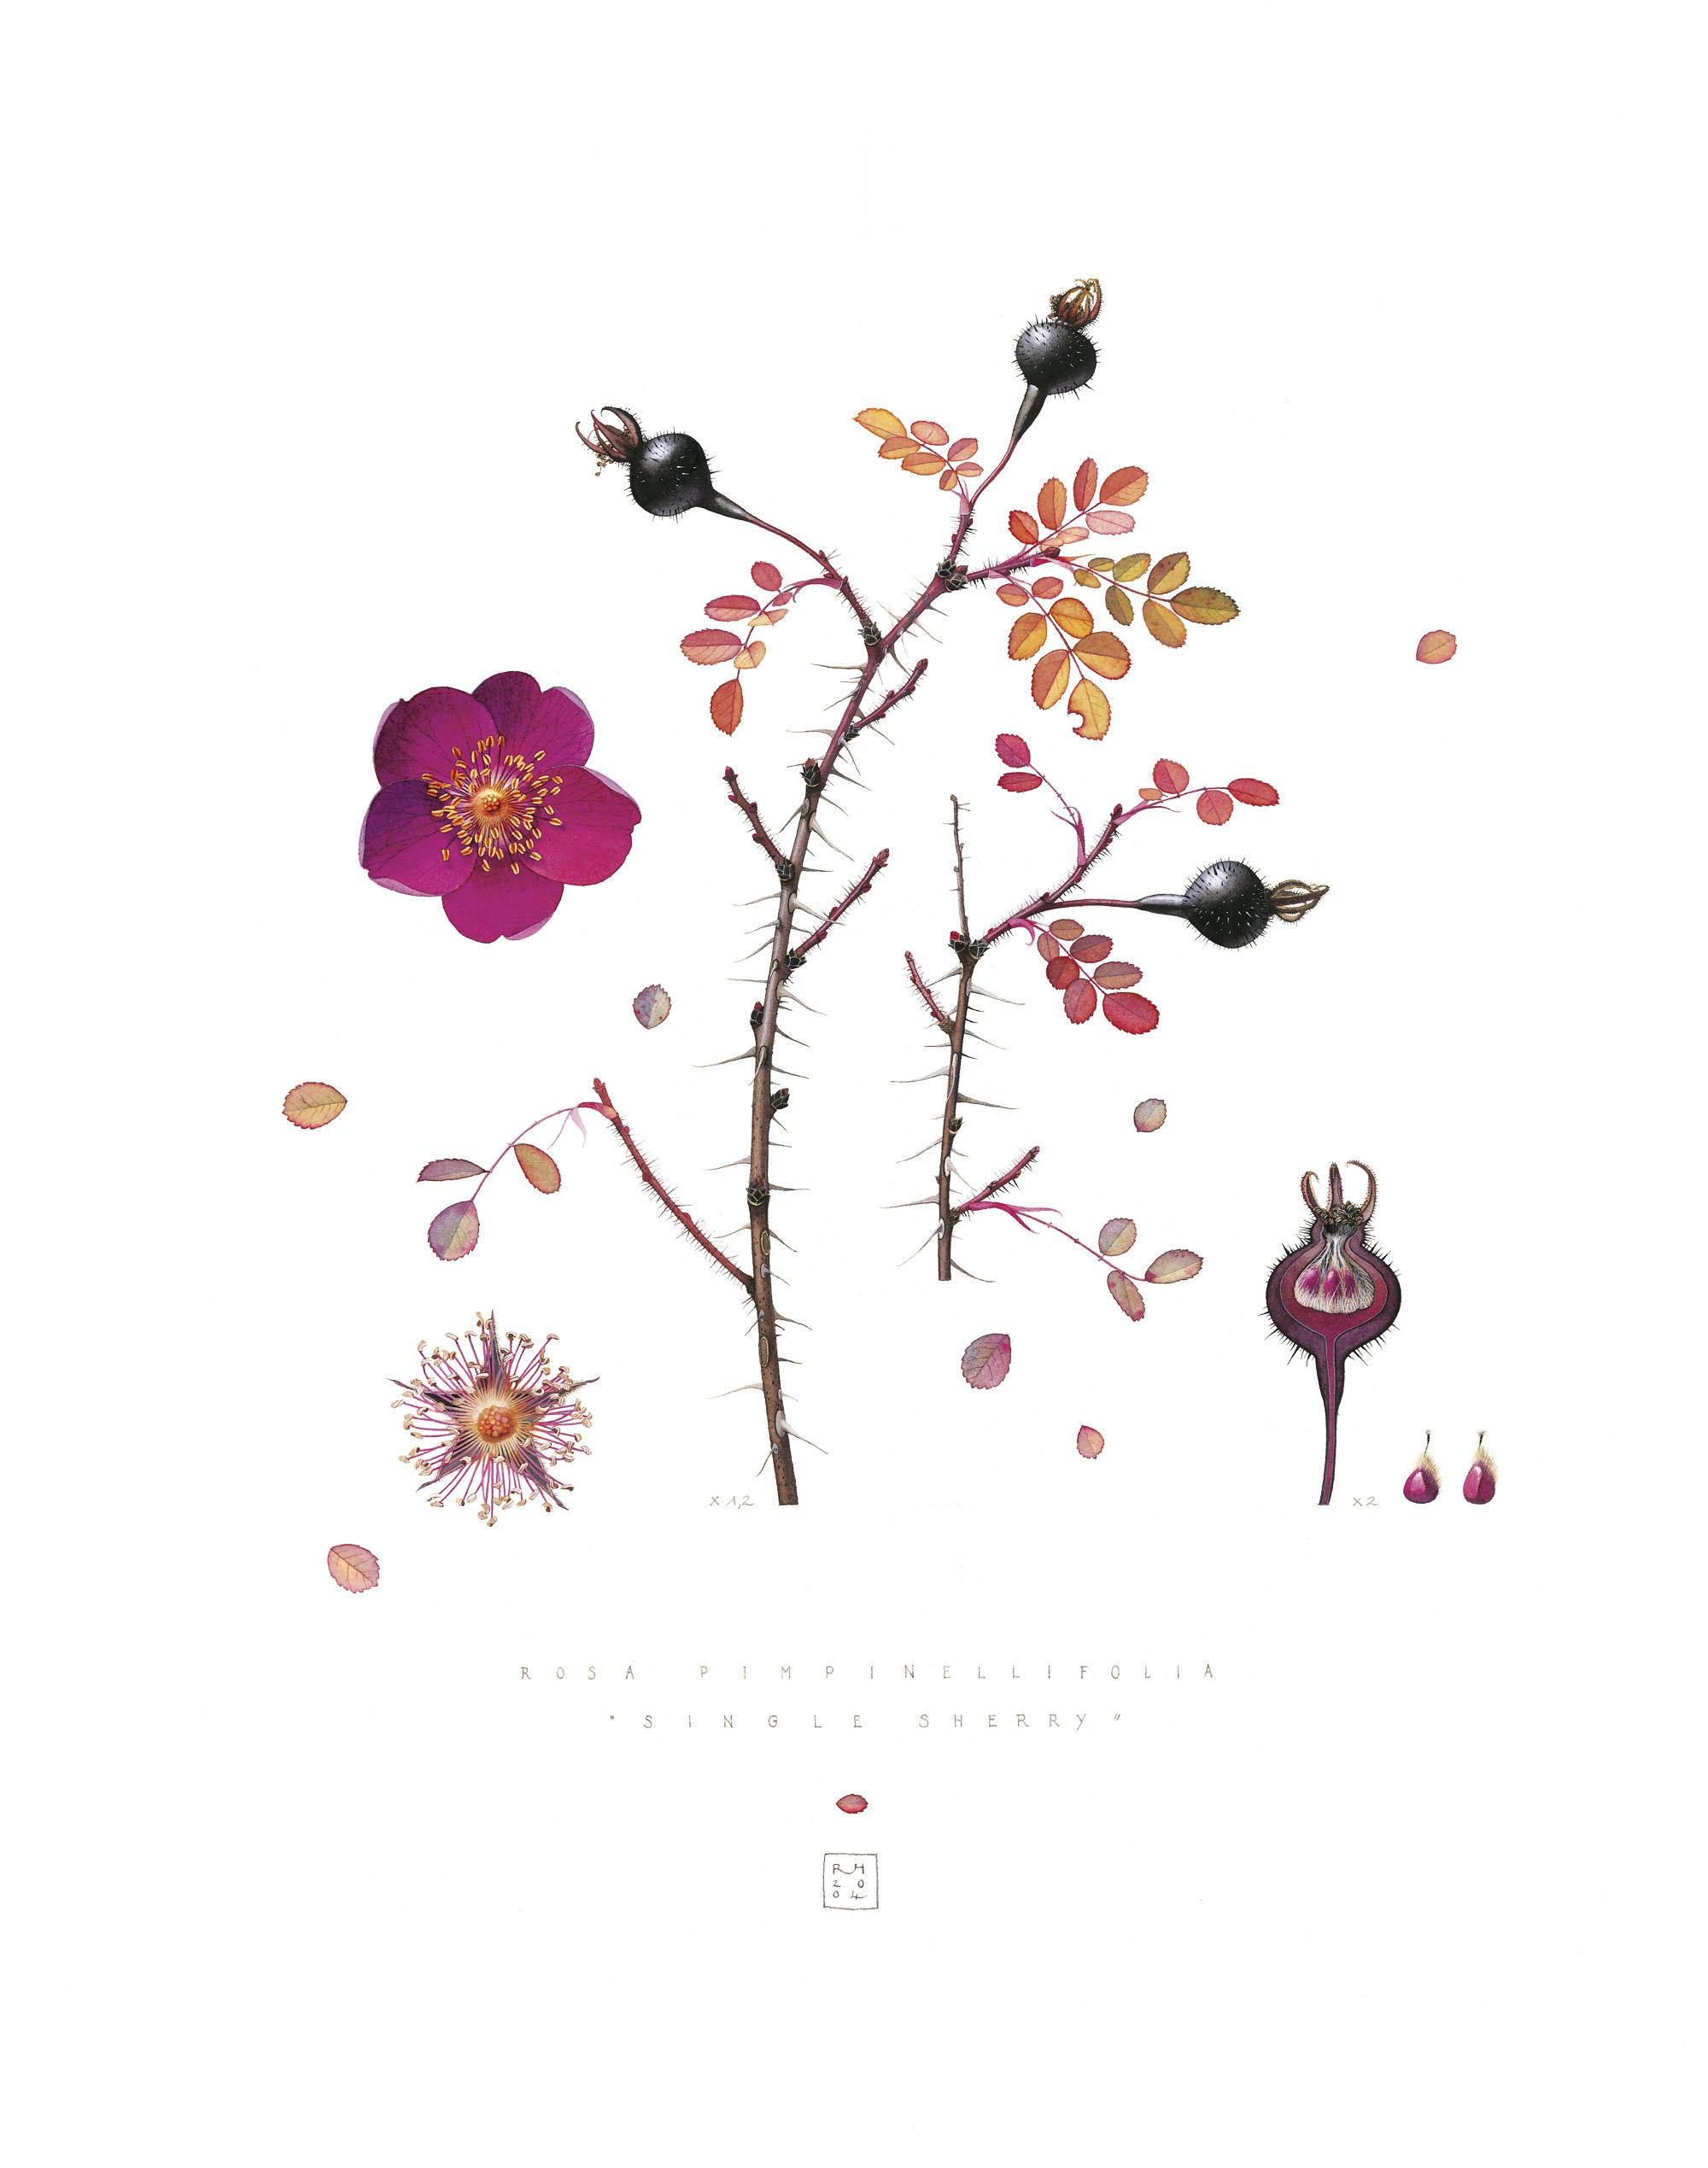 1. Rosa Pimpinellifolia 'Single Sherry'